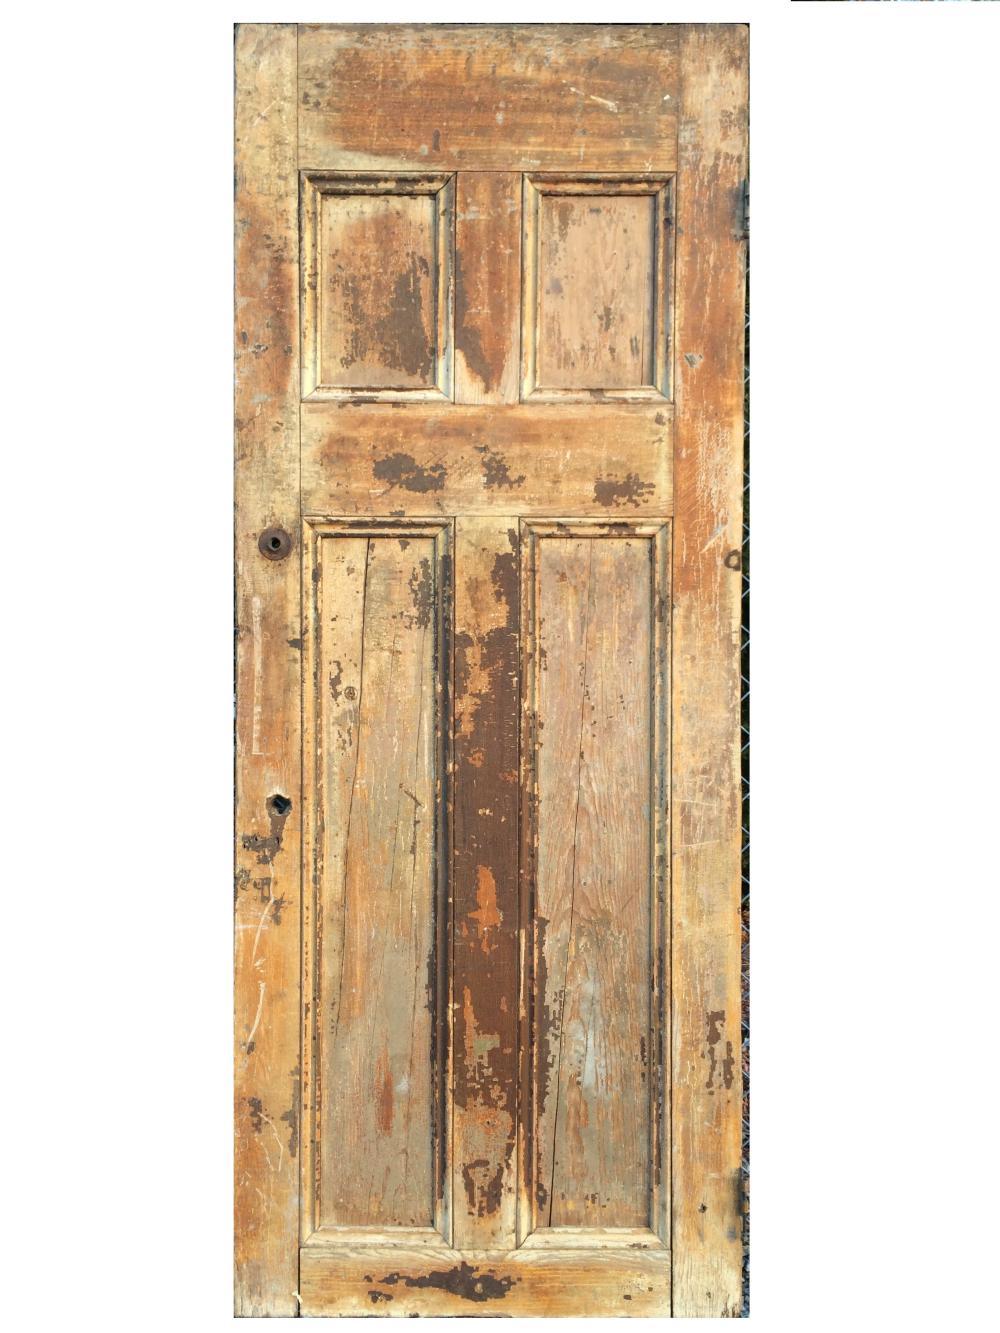 LARGE 18TH C PANELED DOOR